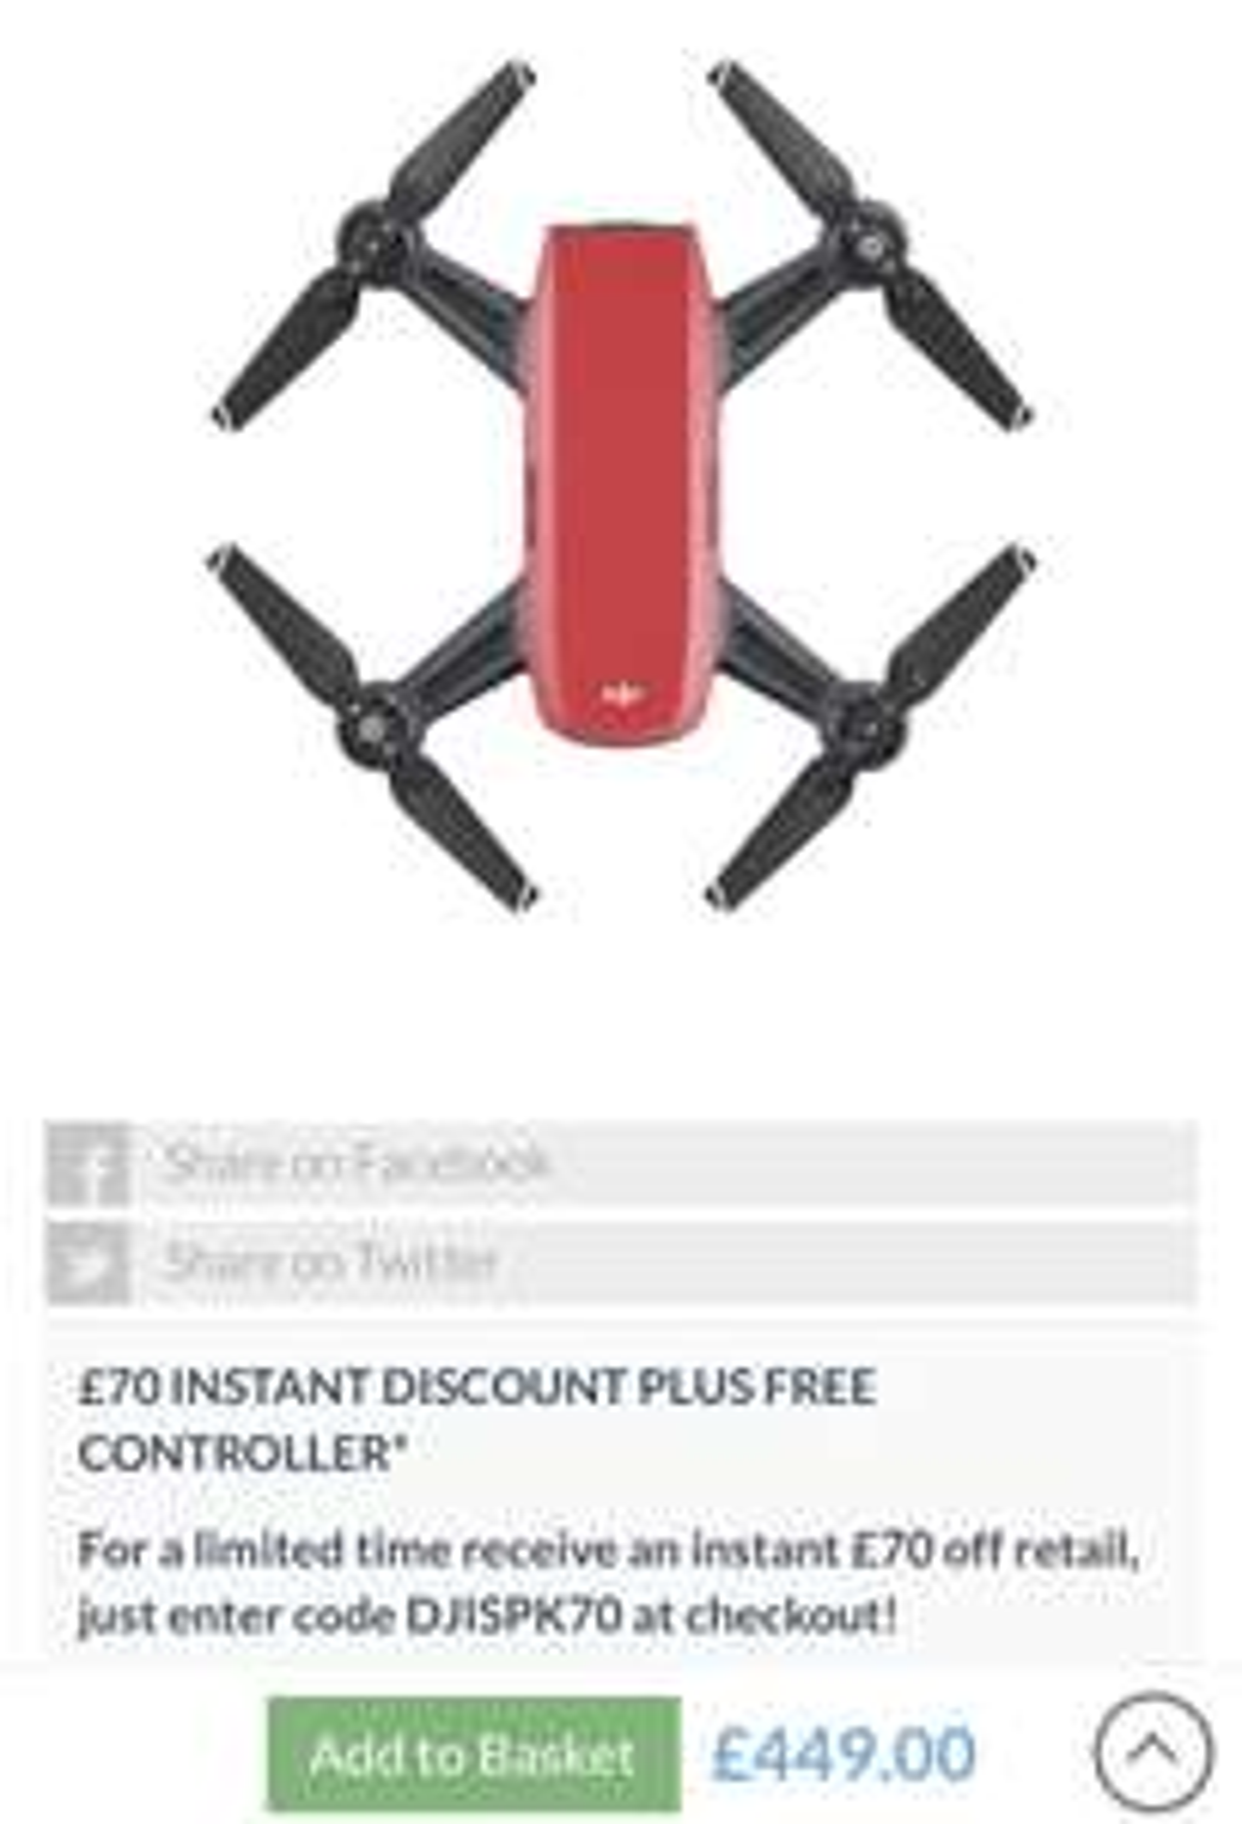 Dji Spark Drone £70 off + Free Controller £379 @ Clifton Cameras